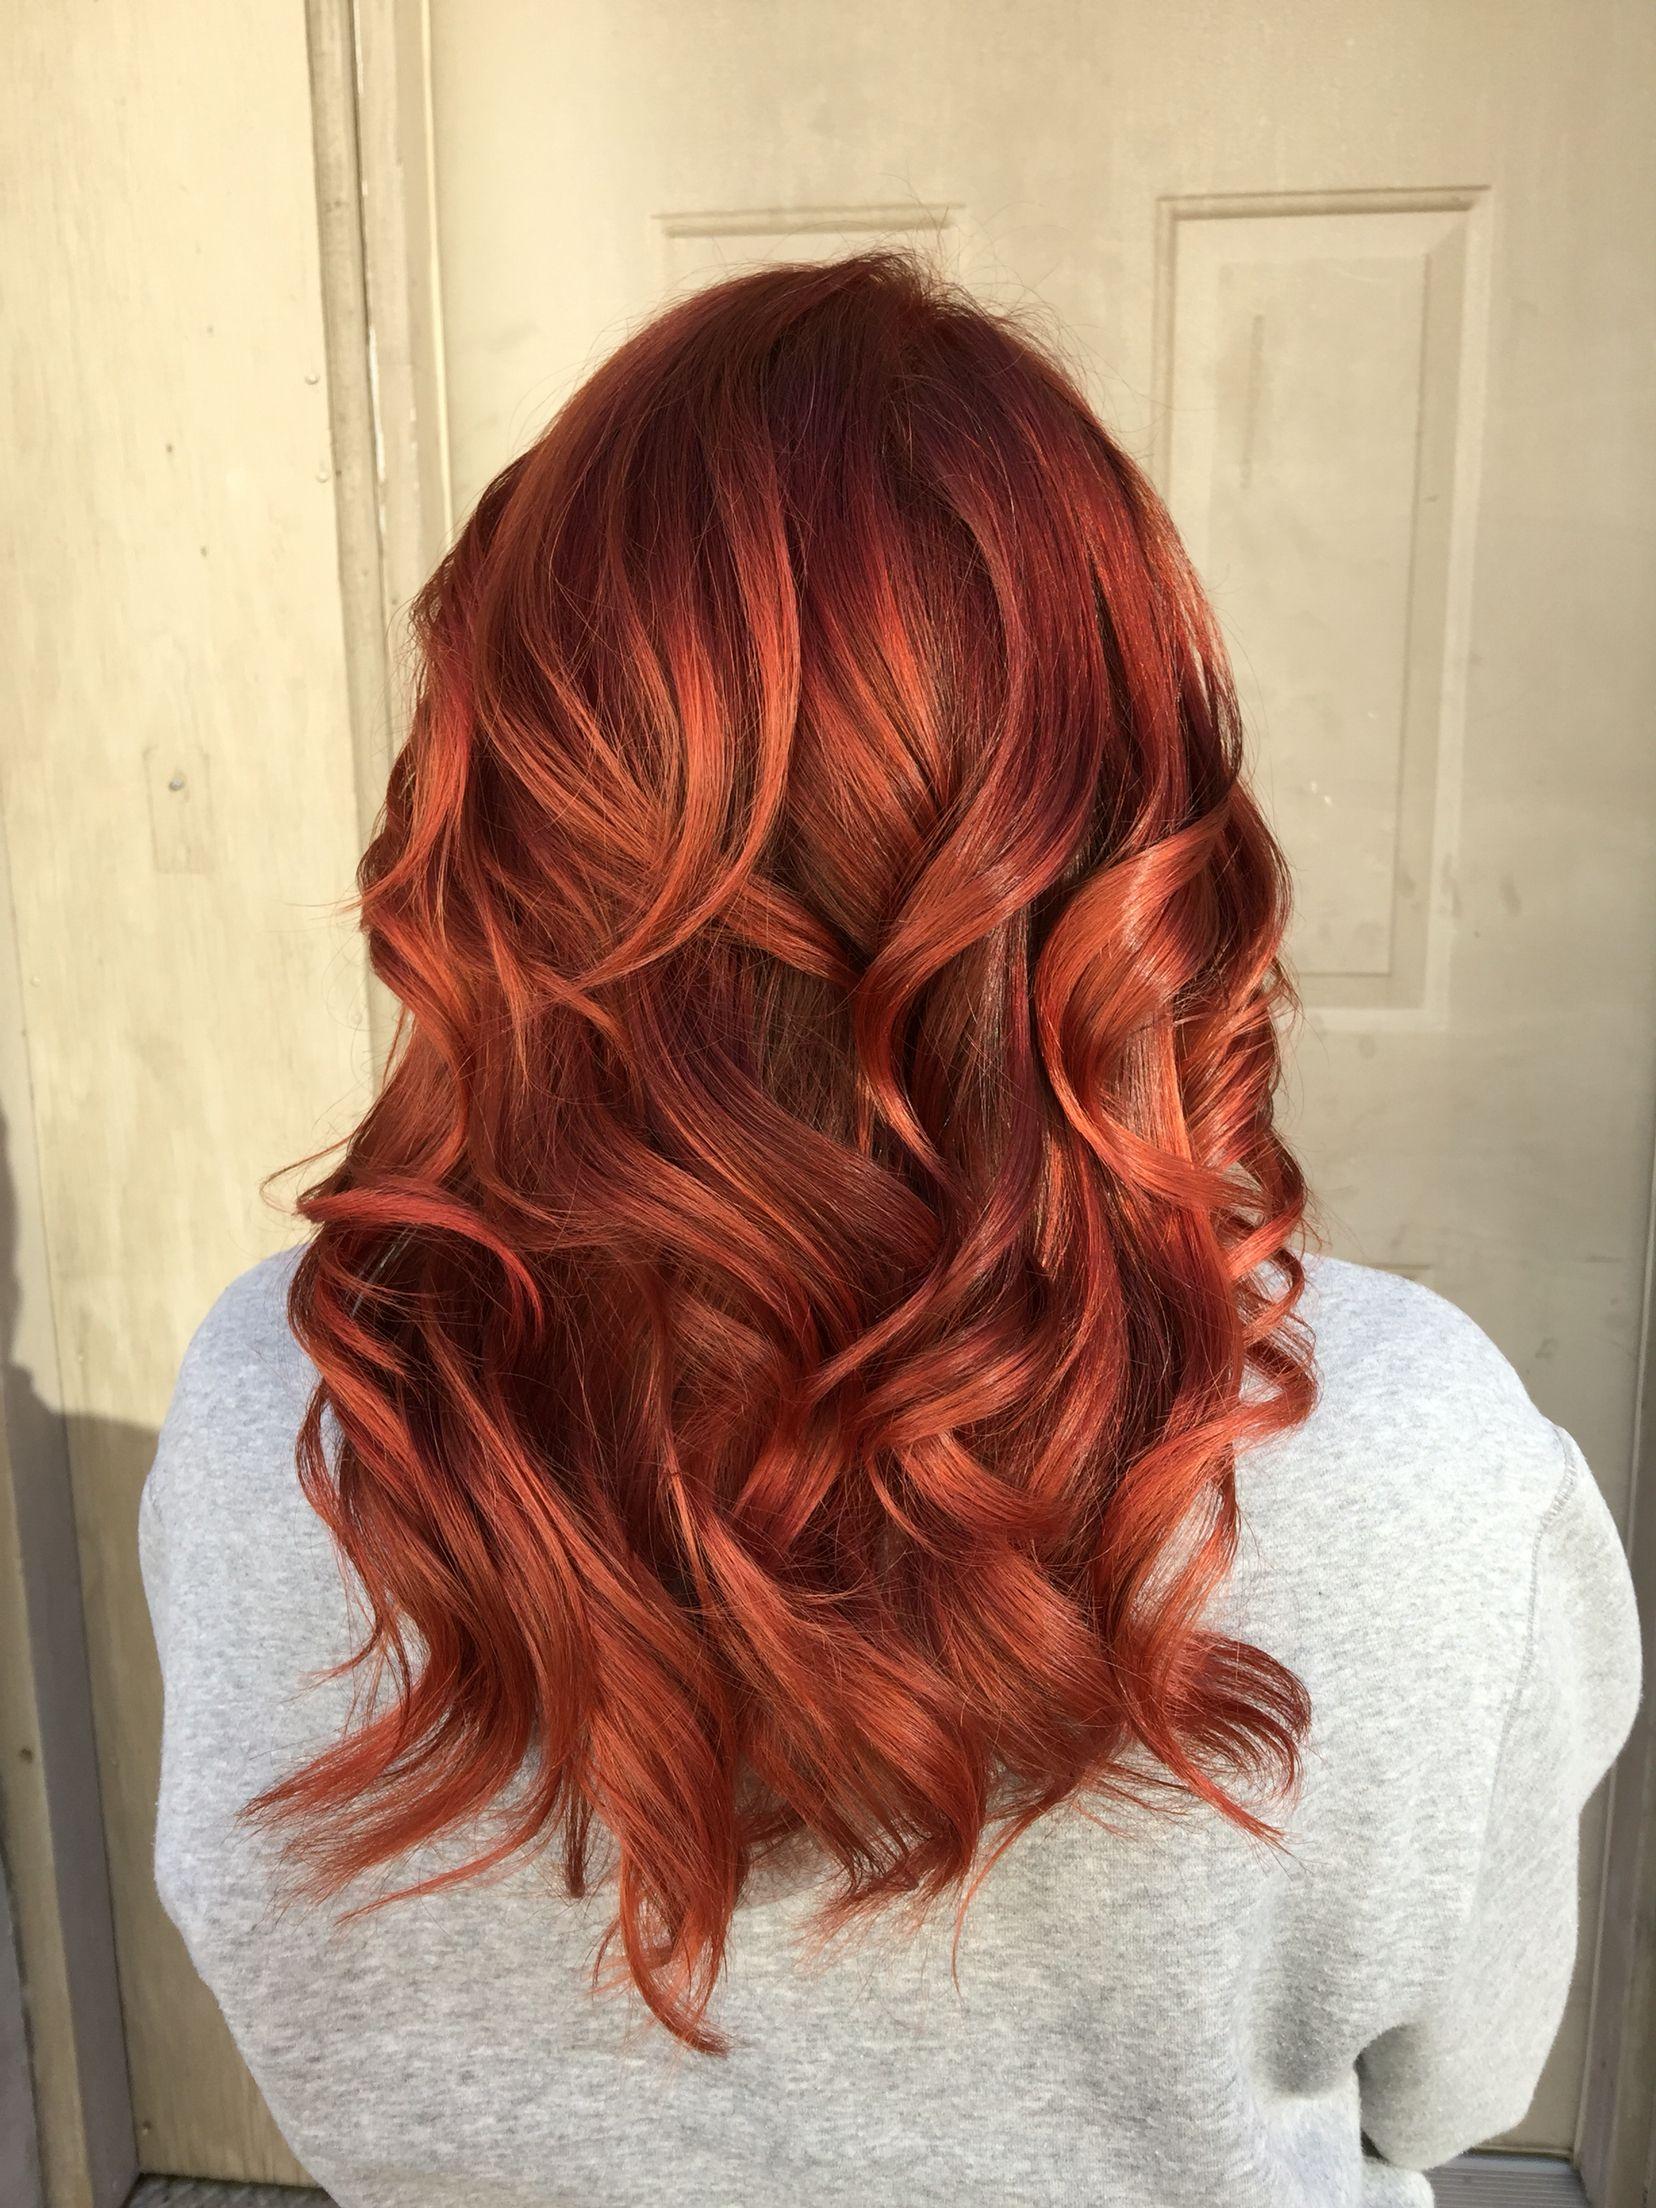 Autumn Red Hair Joico Reds Hair Studio Of Ruston Callie Mccarter